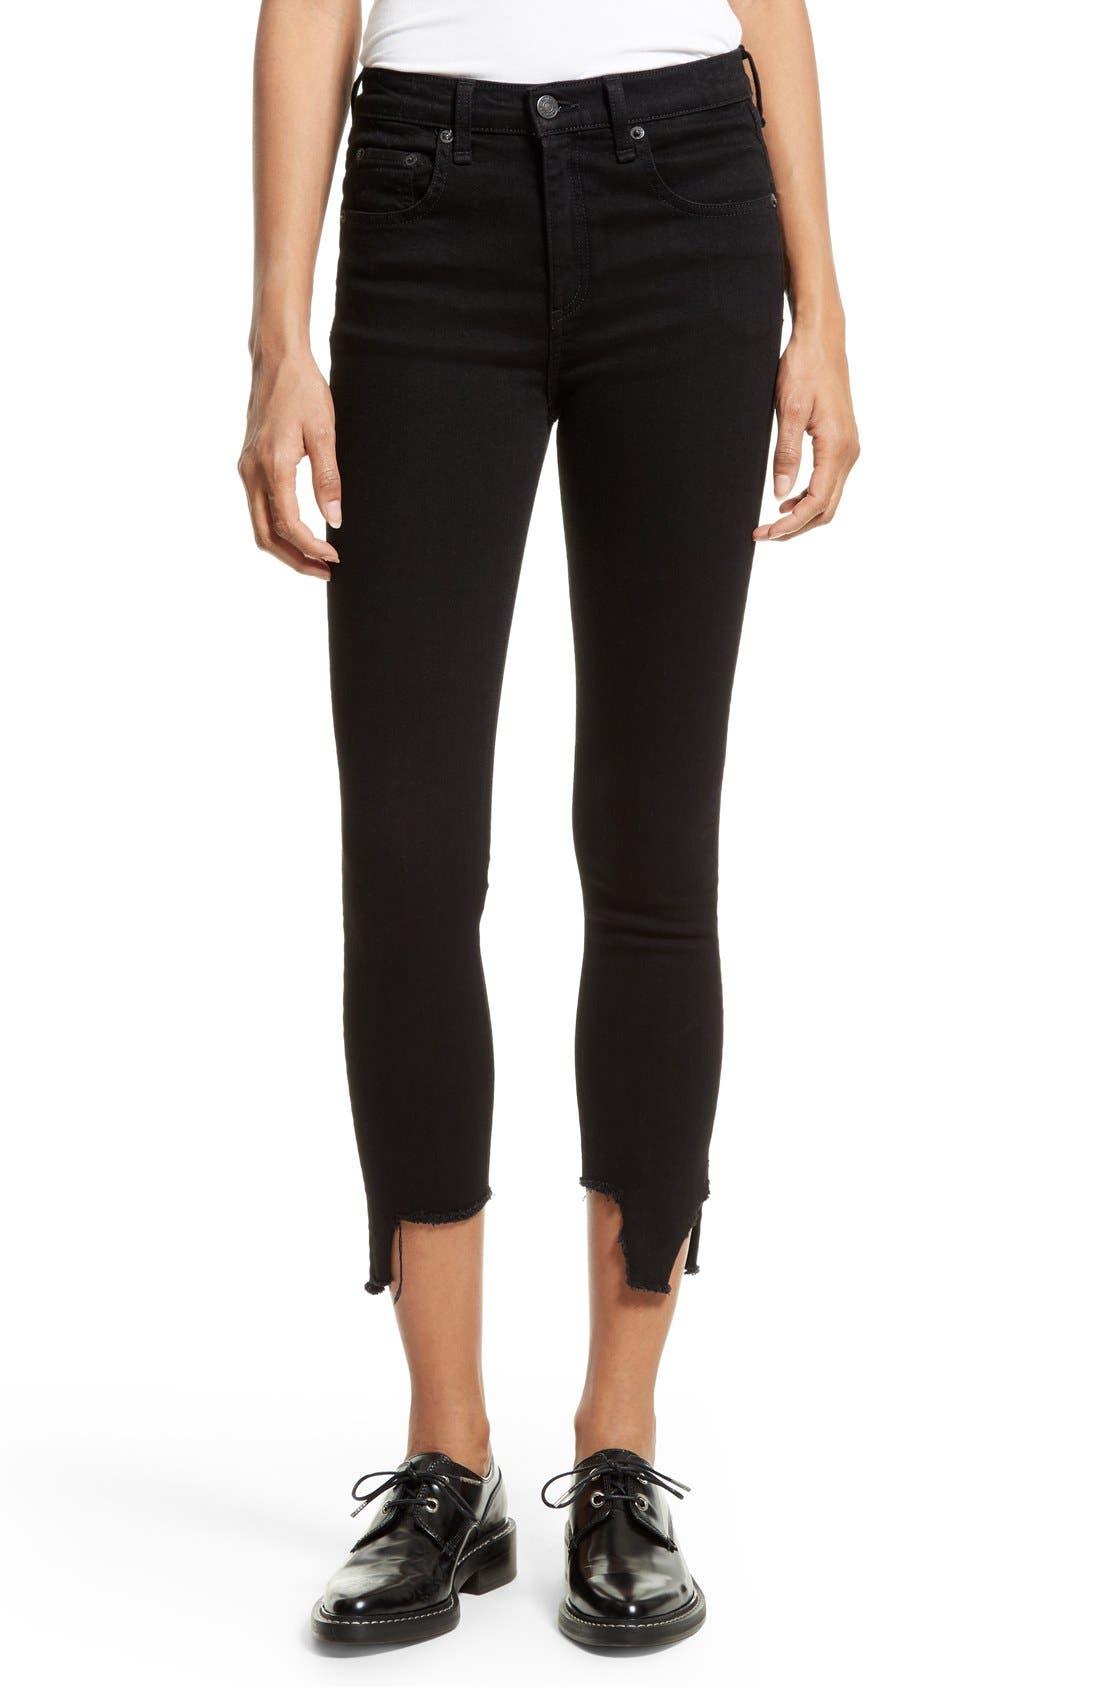 RAG & BONE/JEAN Cutoff Capri Jeans